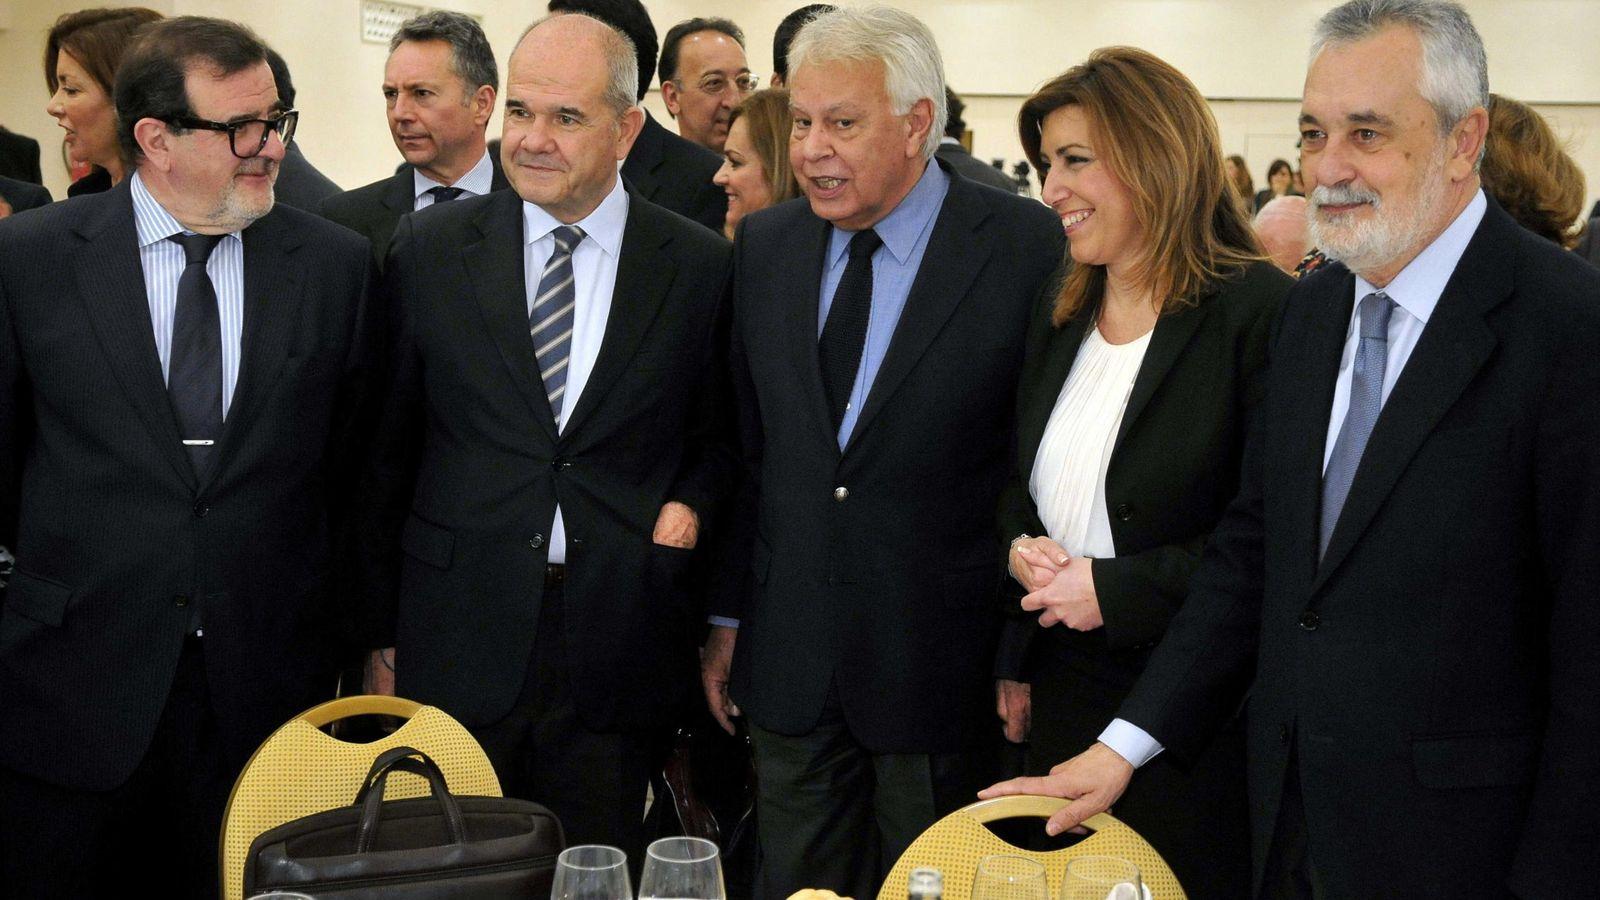 Foto: Manuel Chaves, Felipe González, Susana Díaz y José Antonio Griñán. (EFE)